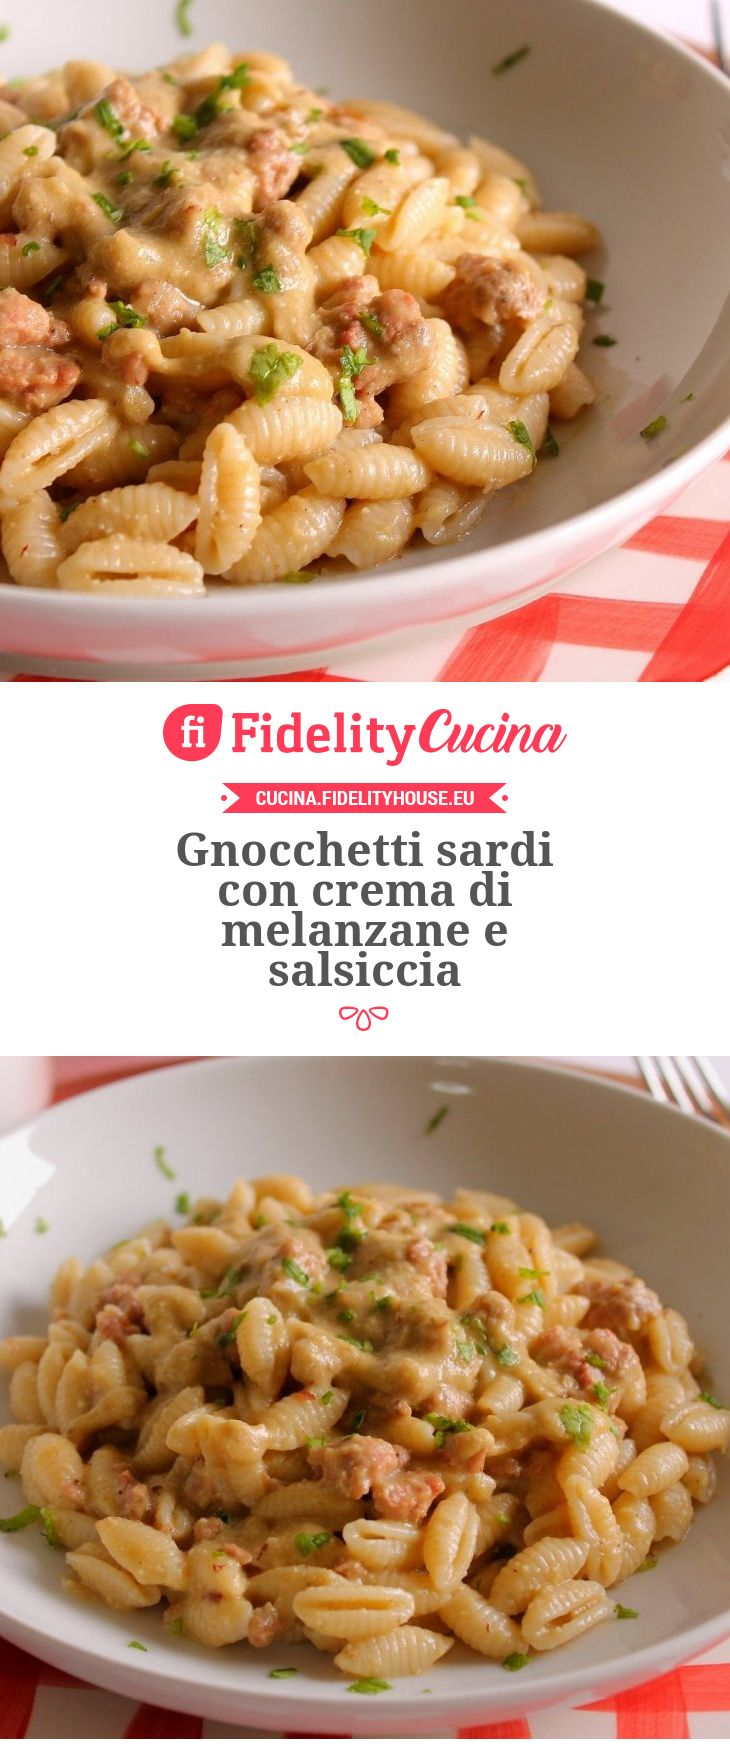 7a4ad382797fddf06a7b68cdc1d17c38 - Gnocchetti Sardi Ricette